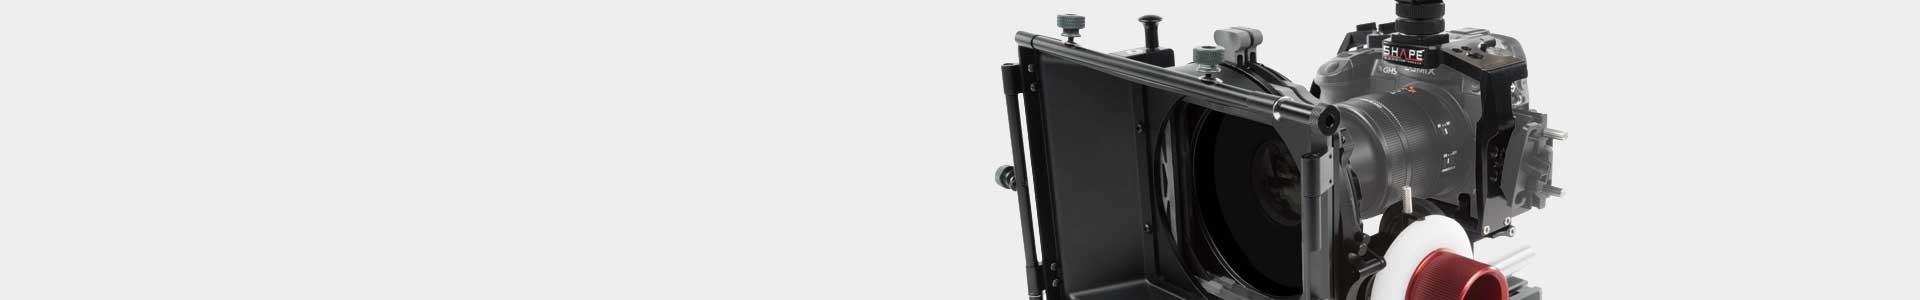 Accesorios para Cámaras DSLR en Avacab Audiovisuales